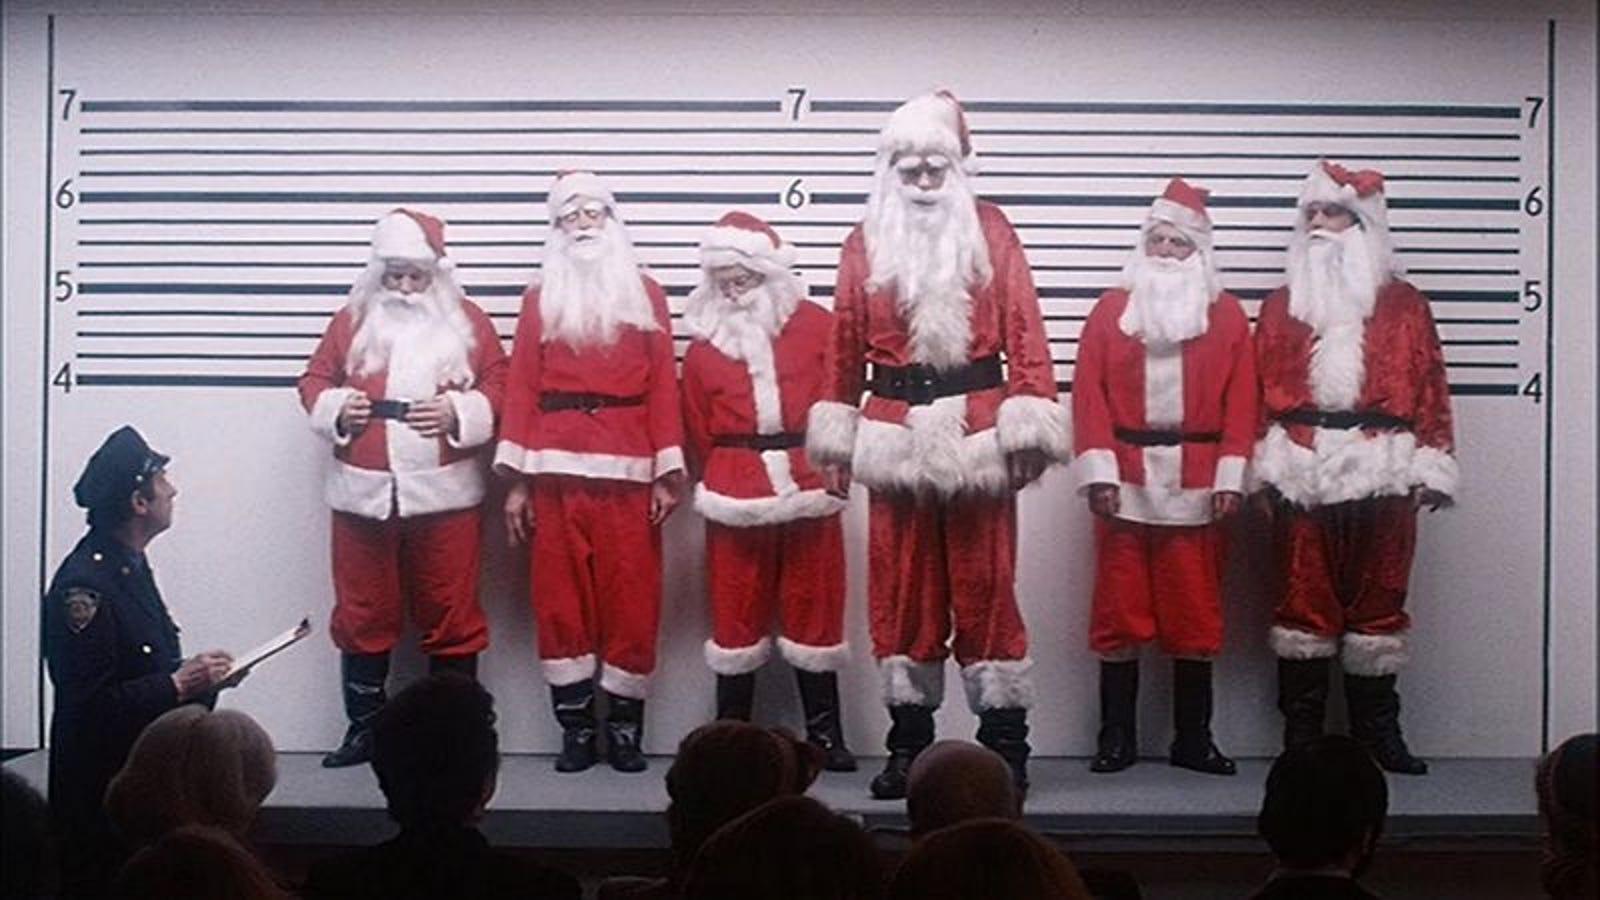 The night Santa went crazy: 18 killer Santas from TV and film